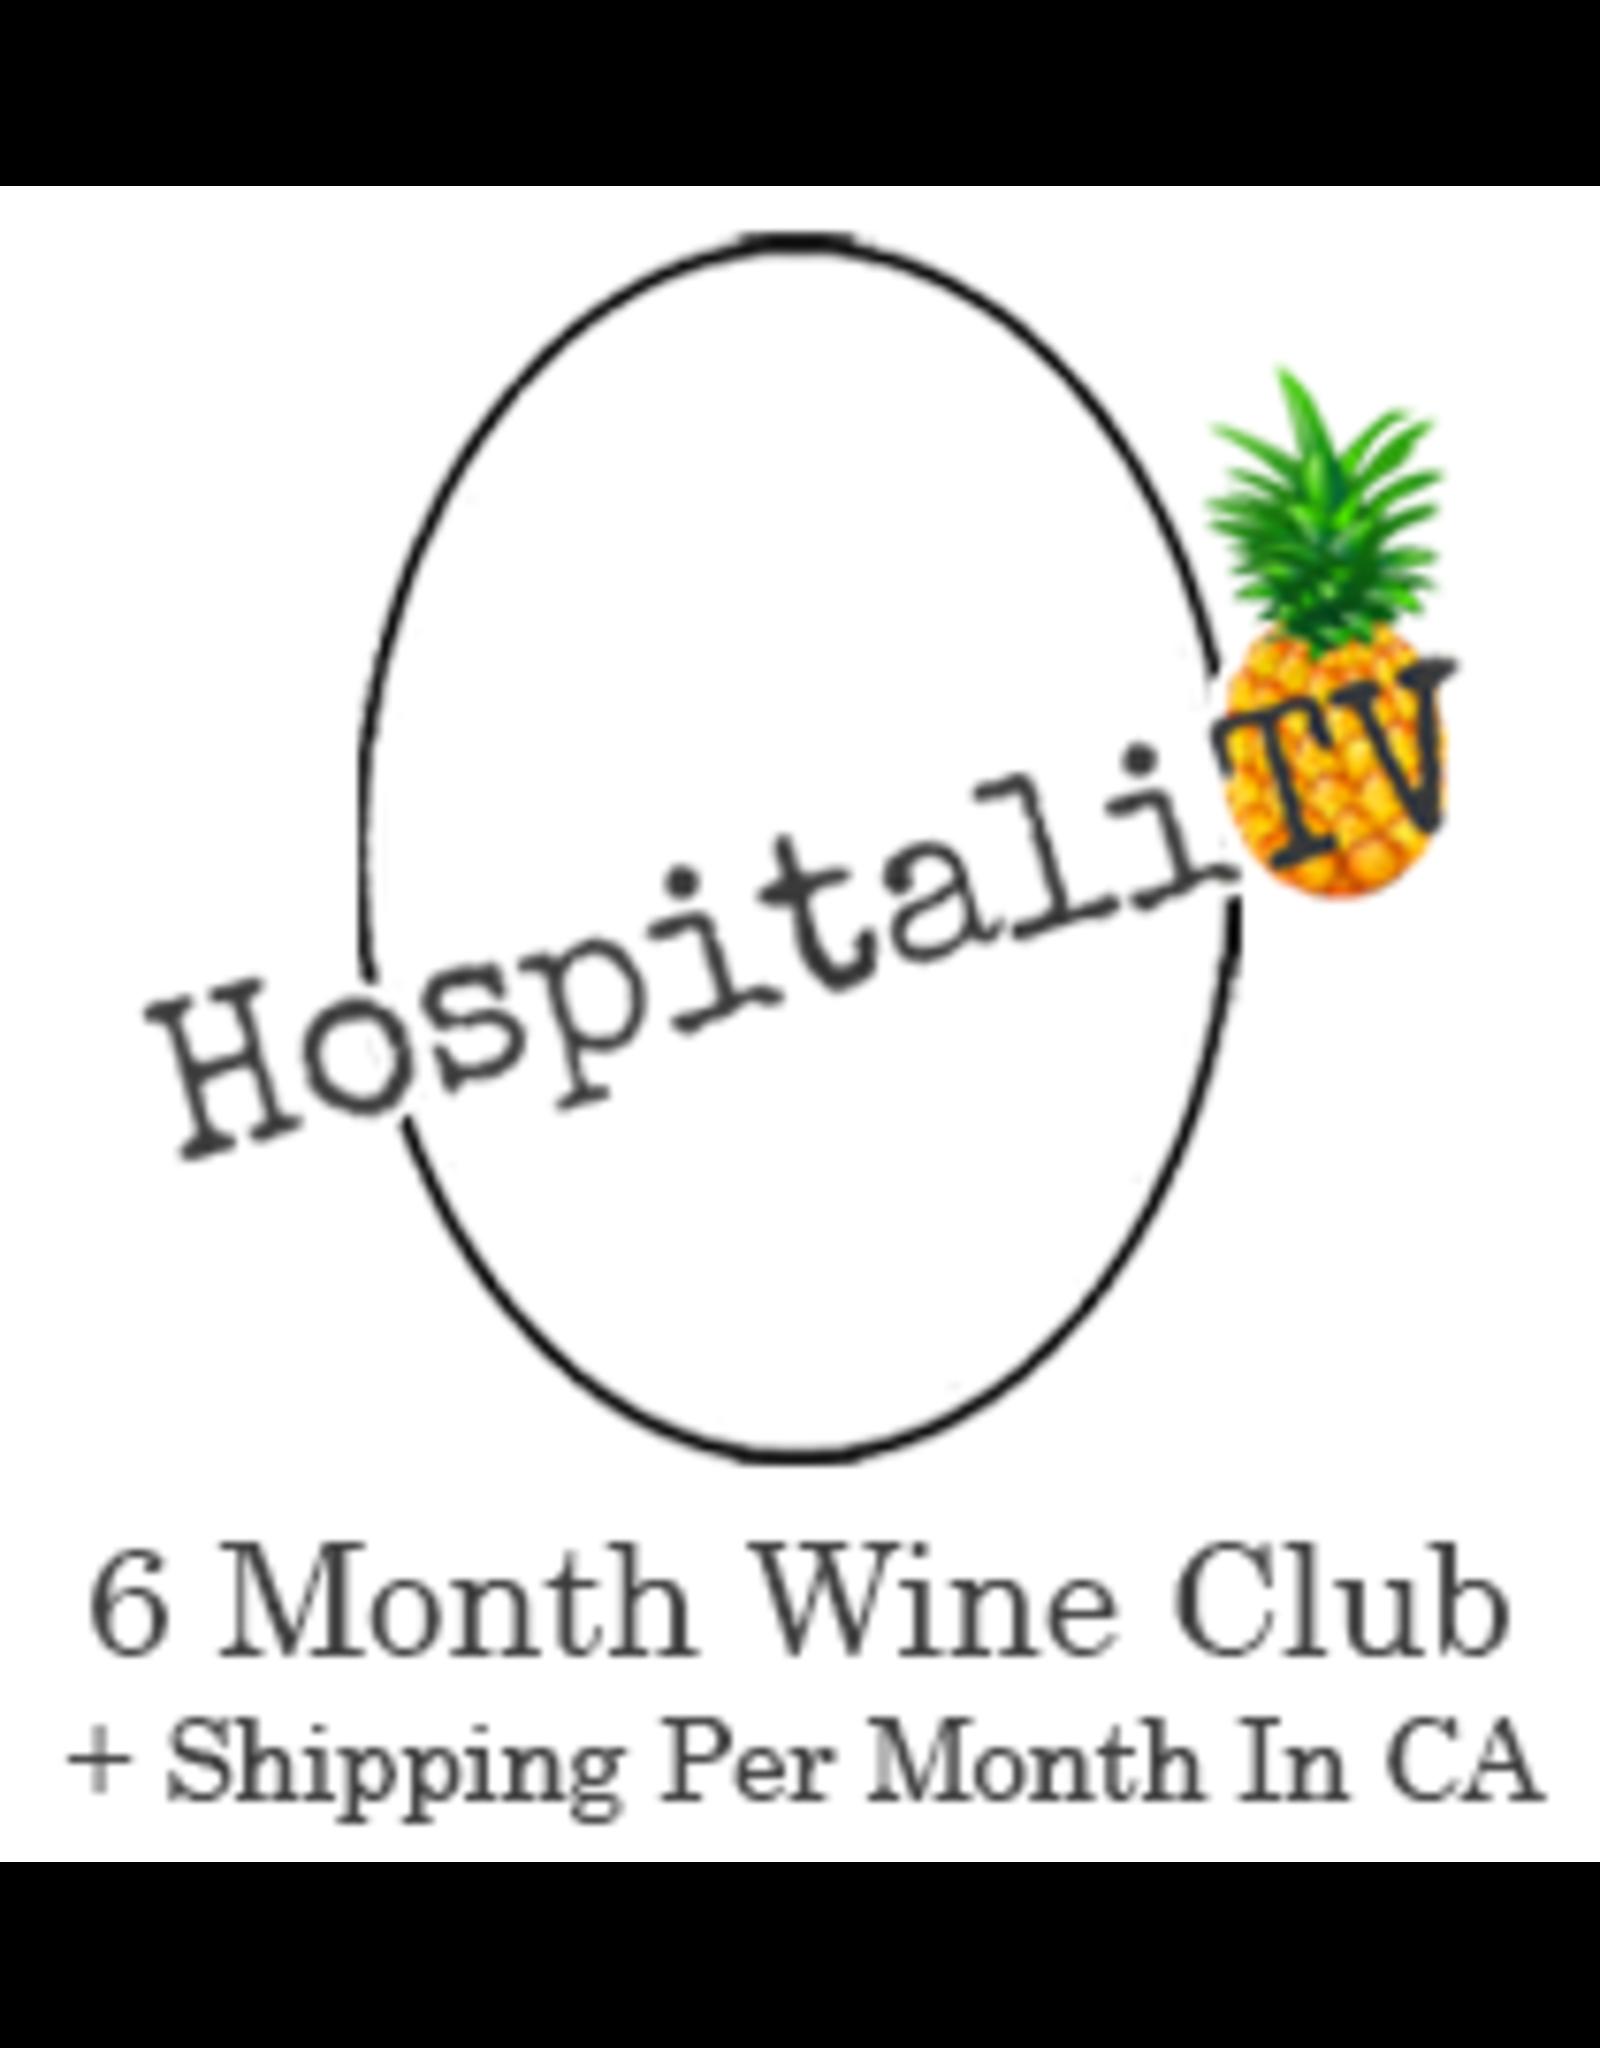 HospitaliTV Wine Club 6 Month plus CA shipping